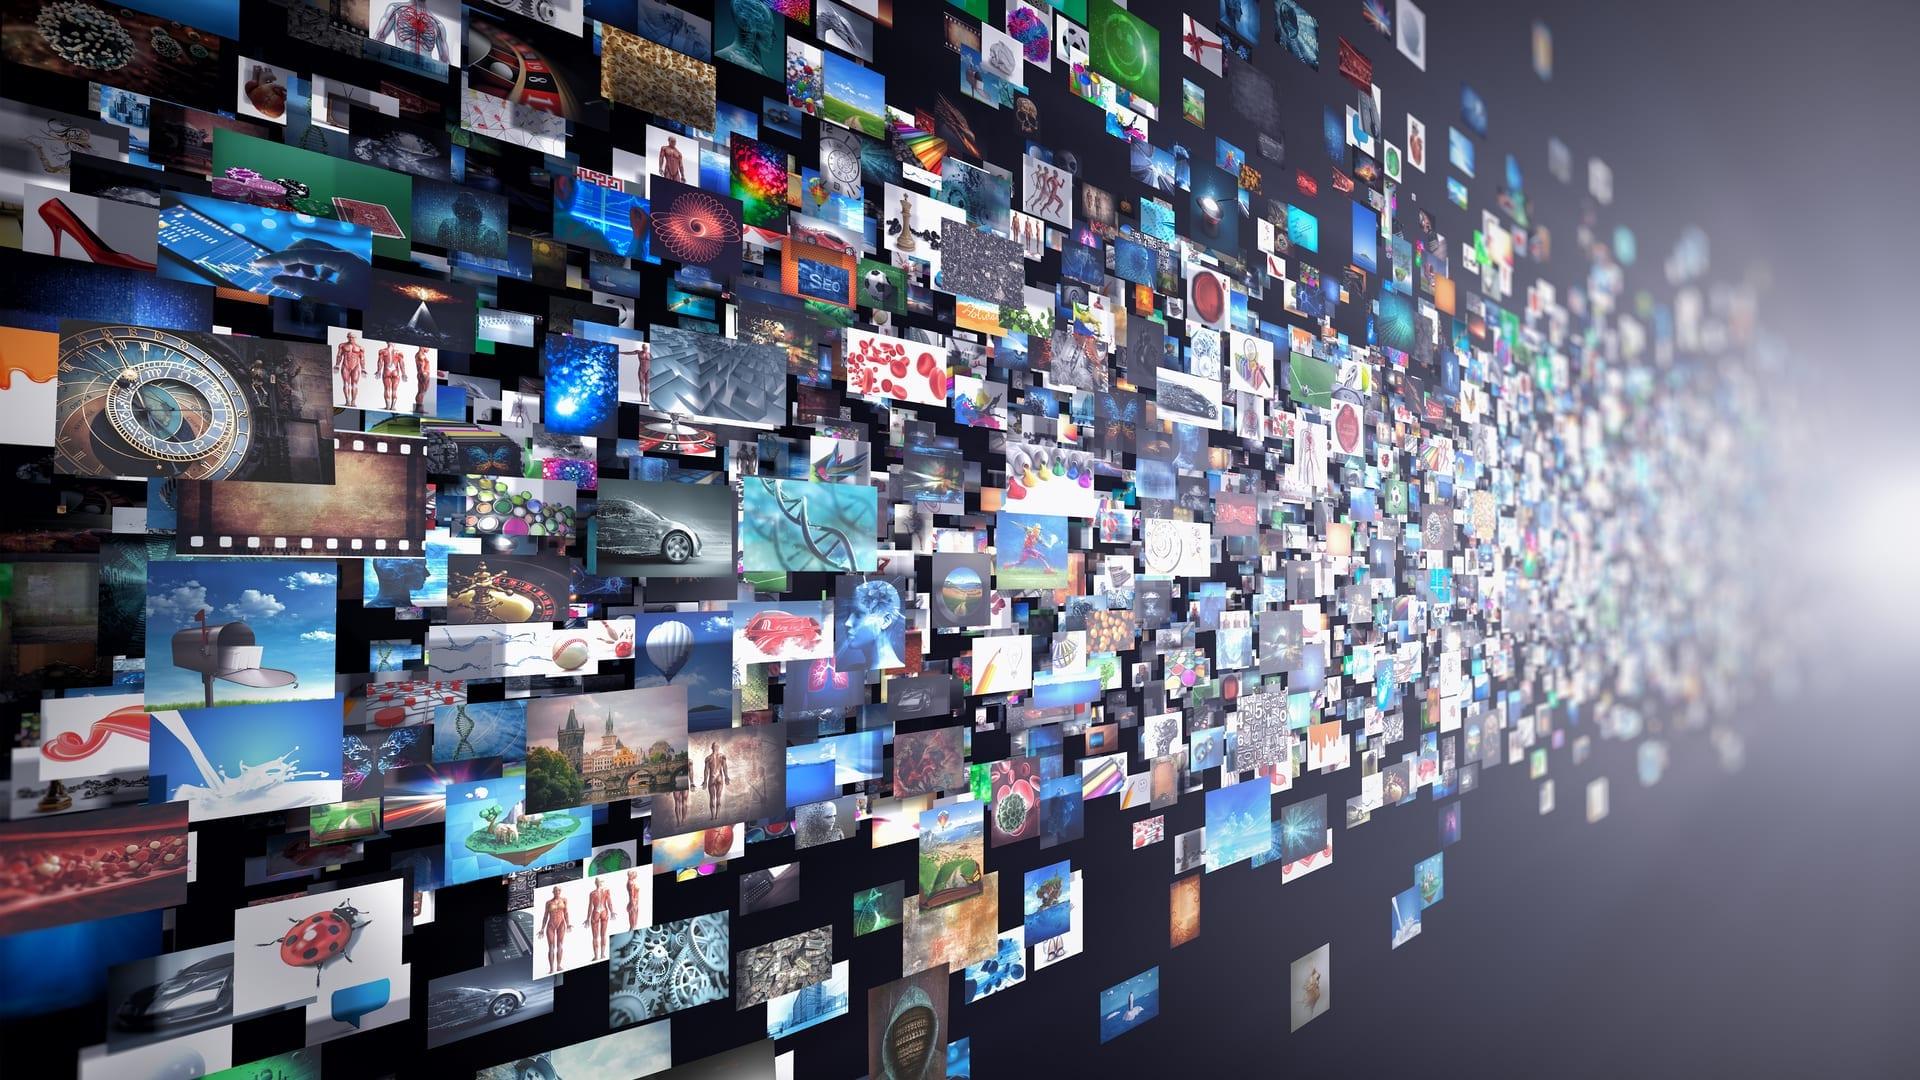 Desarrollo de productos Global OTT Market 2020: Facebook, YouTube (Google), Netflix, Twitter, Amazon, LinkedIn, Apple, Skype (Microsoft...